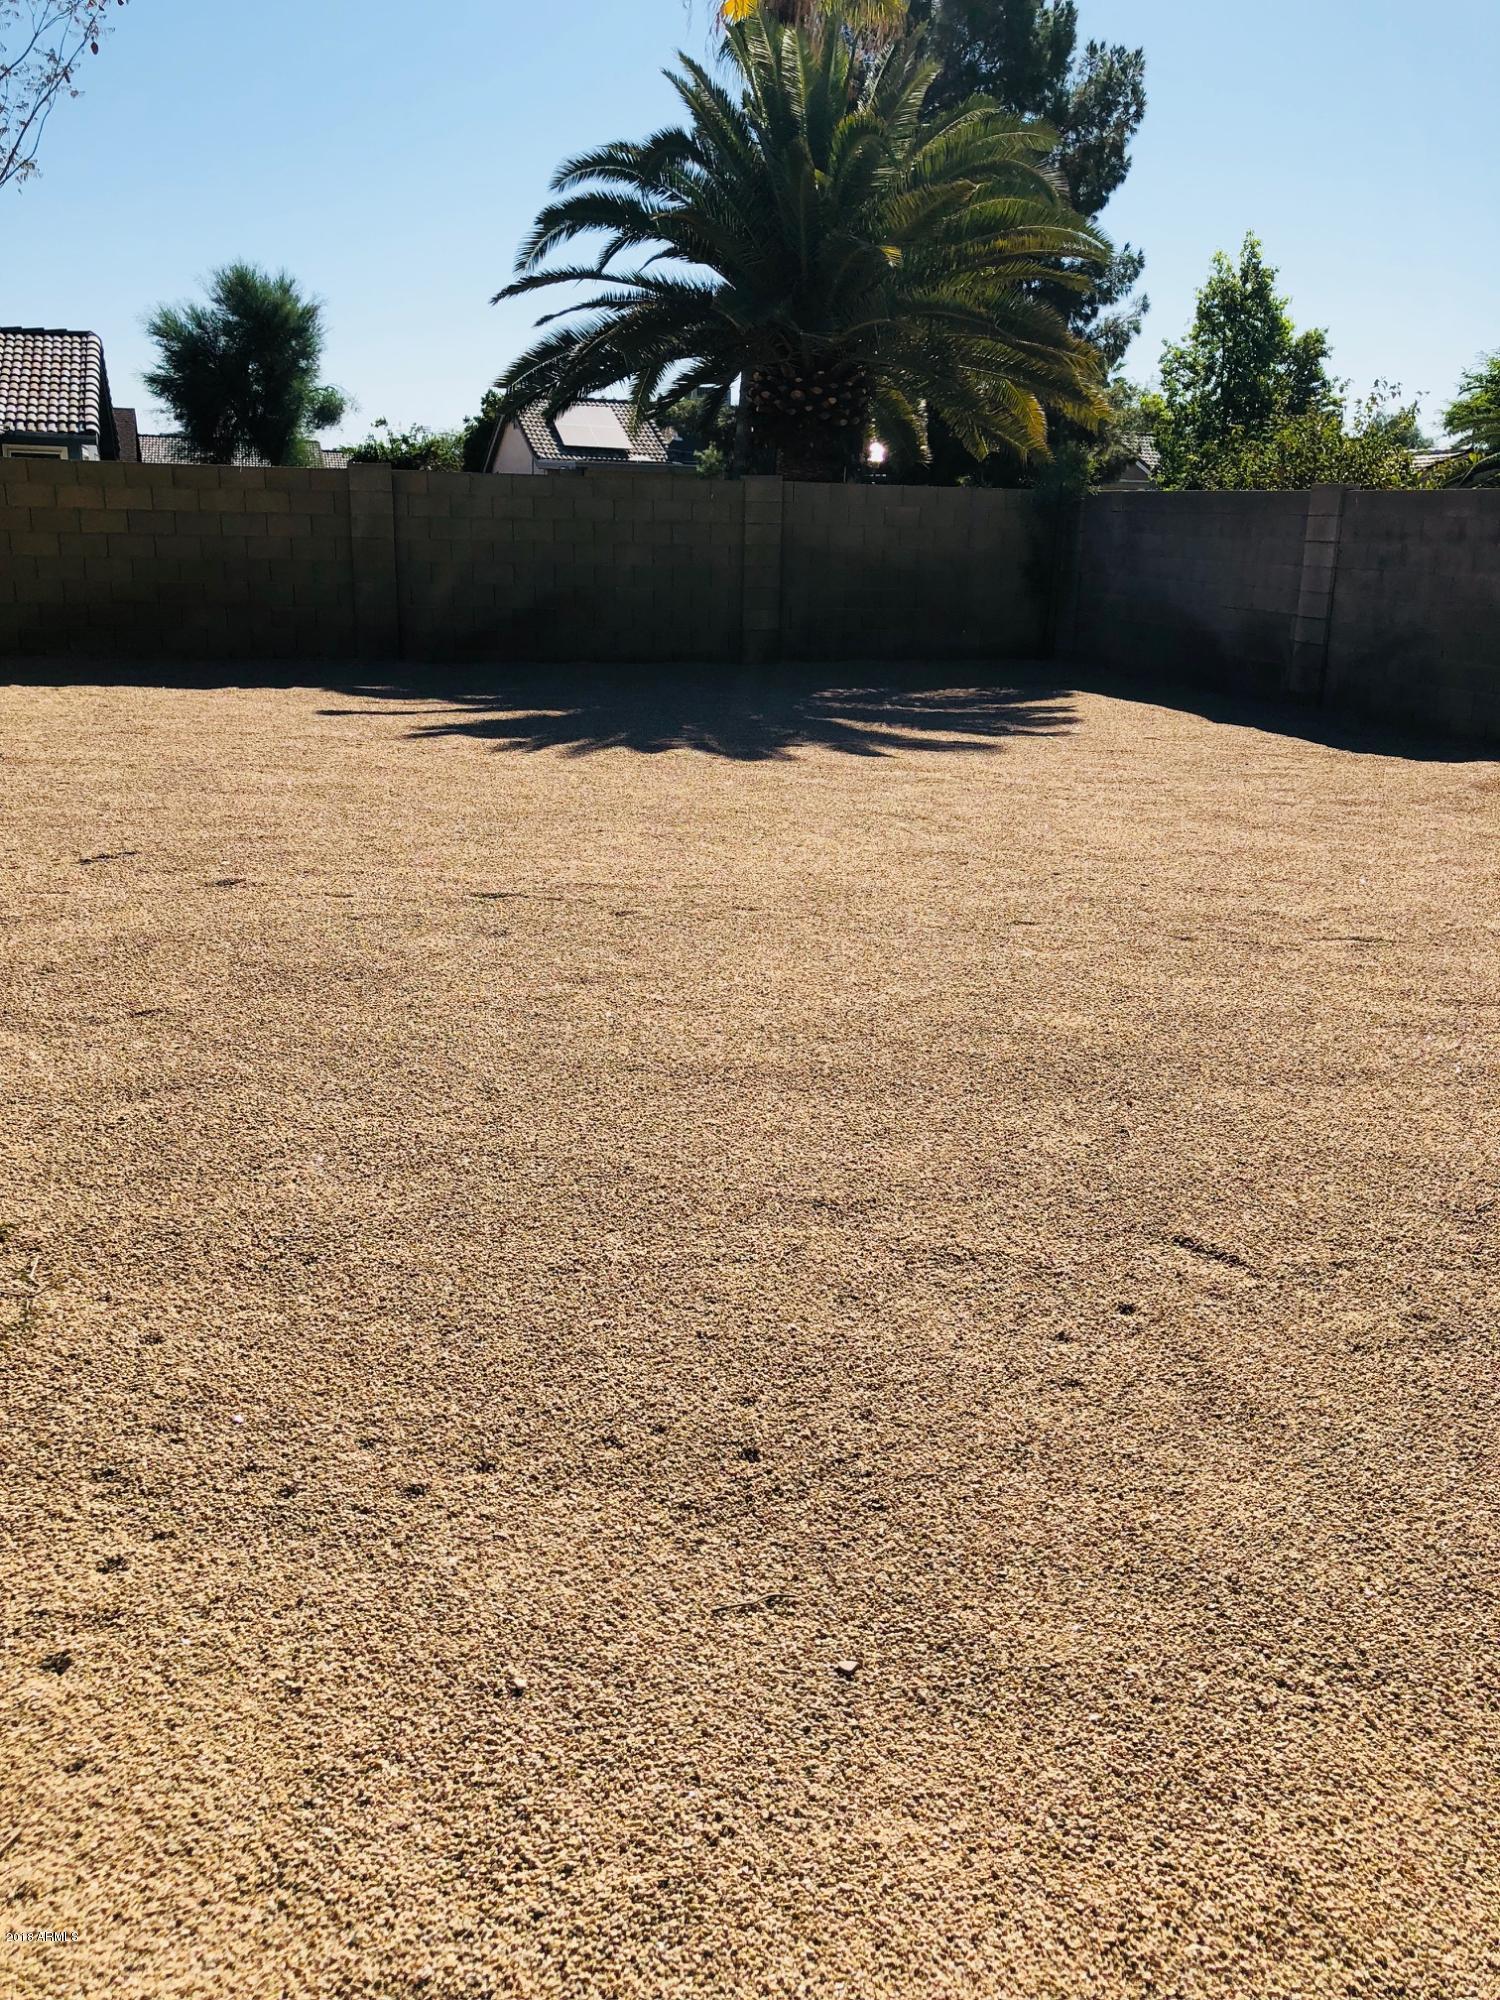 MLS 5821412 5647 W VILLA THERESA Drive, Glendale, AZ 85308 Glendale AZ REO Bank Owned Foreclosure